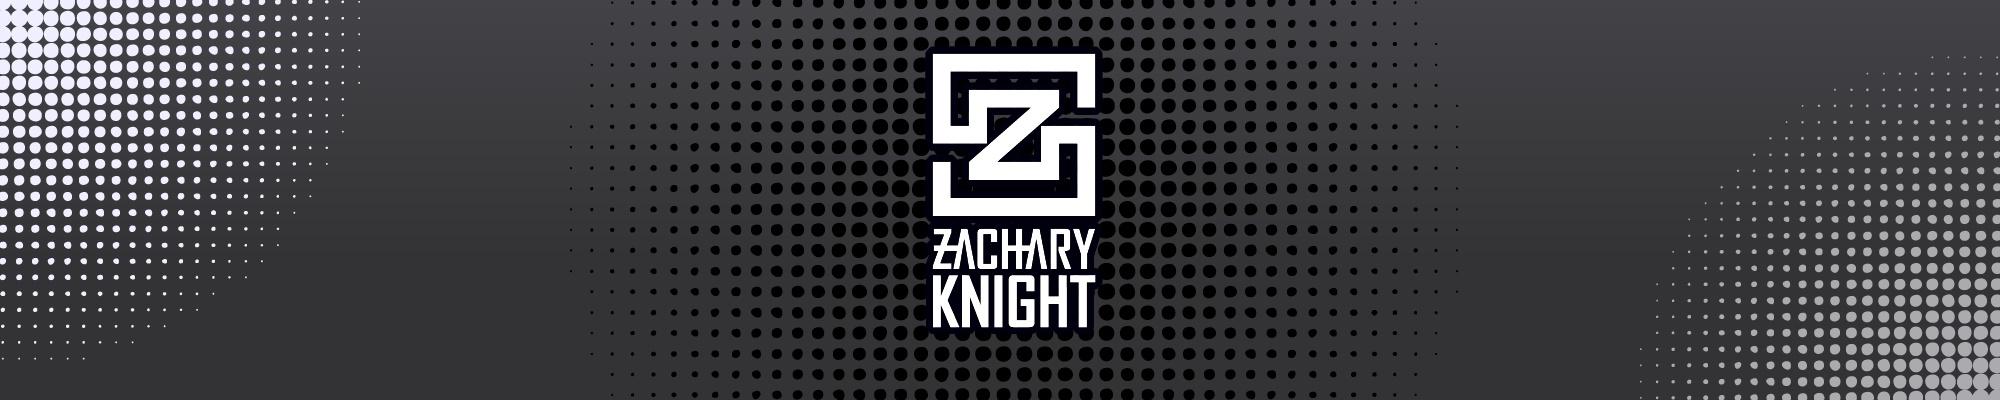 Zknight Cover